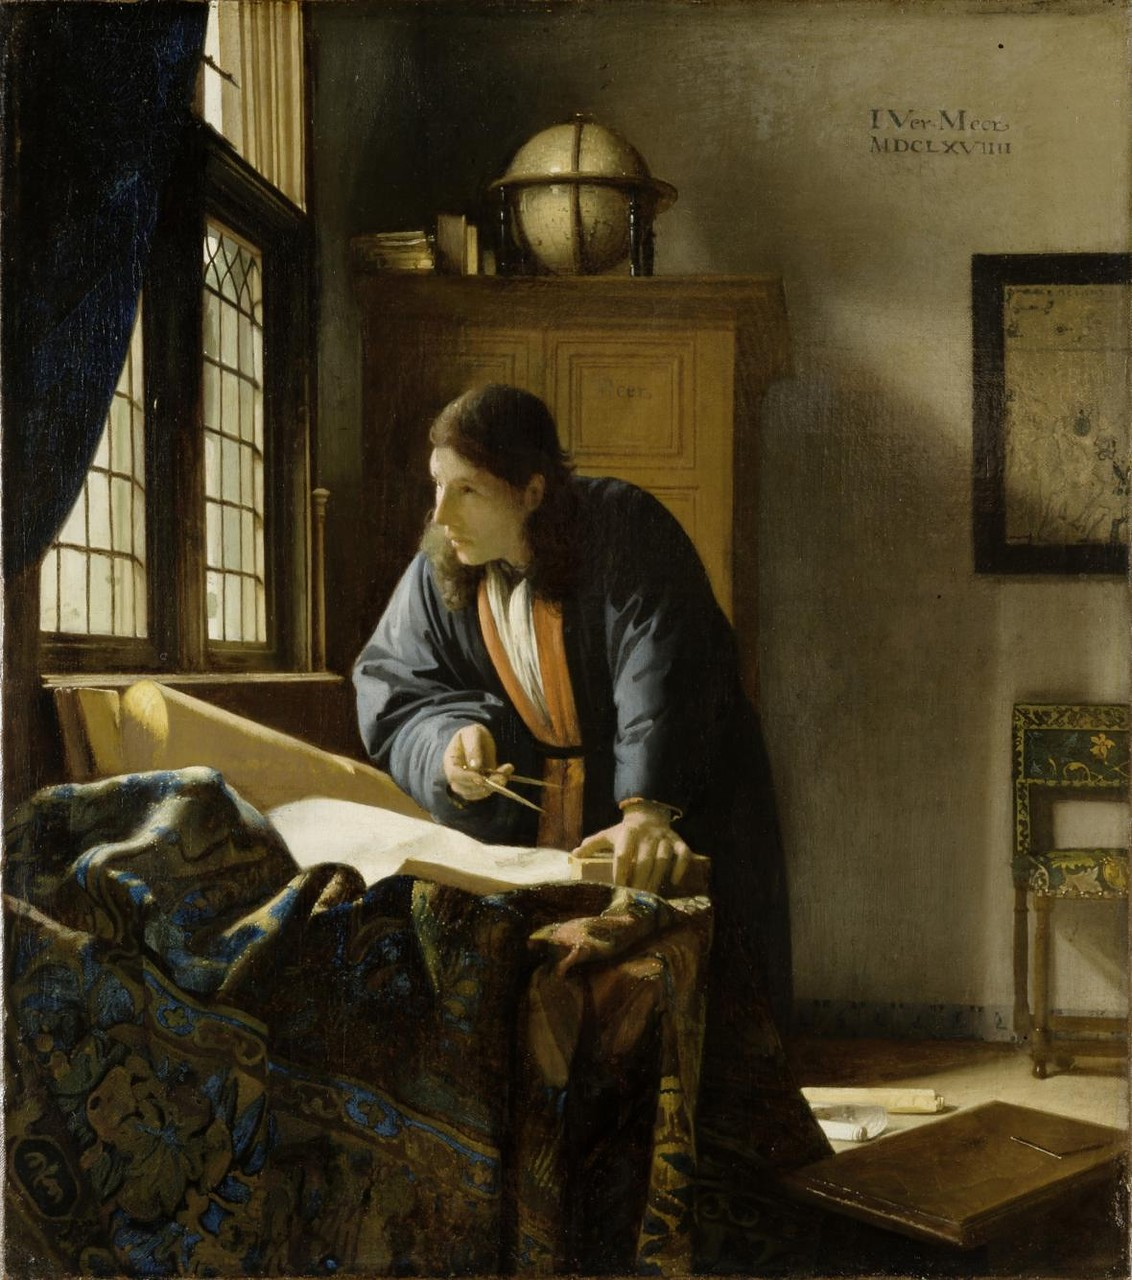 1878702-18_vermeer_the_geographercstdel_museum_-_artothek.jpg